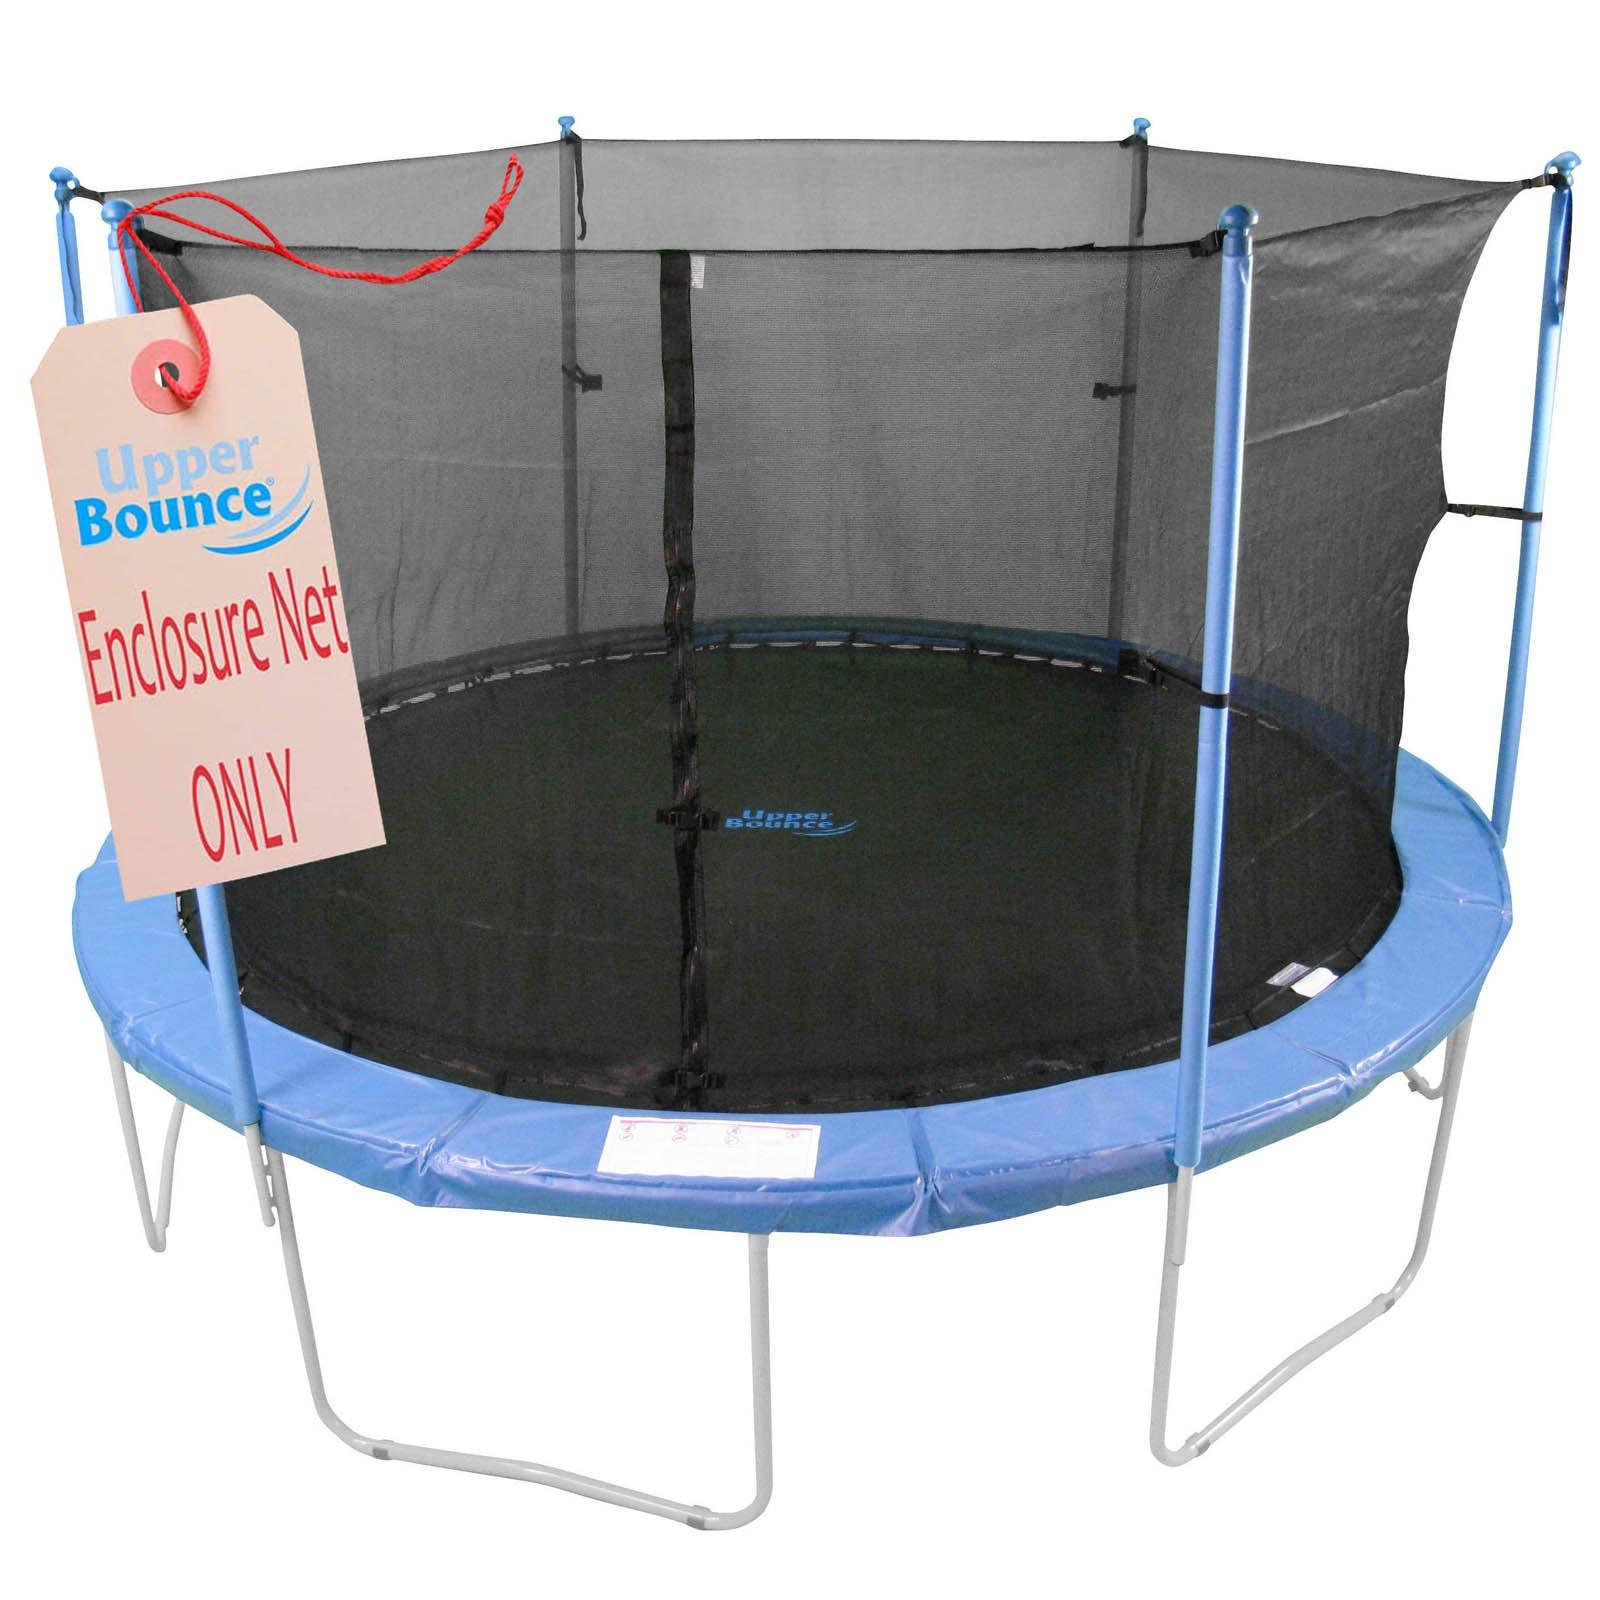 Upper Bounce 13 ft. Trampoline Enclosure Net